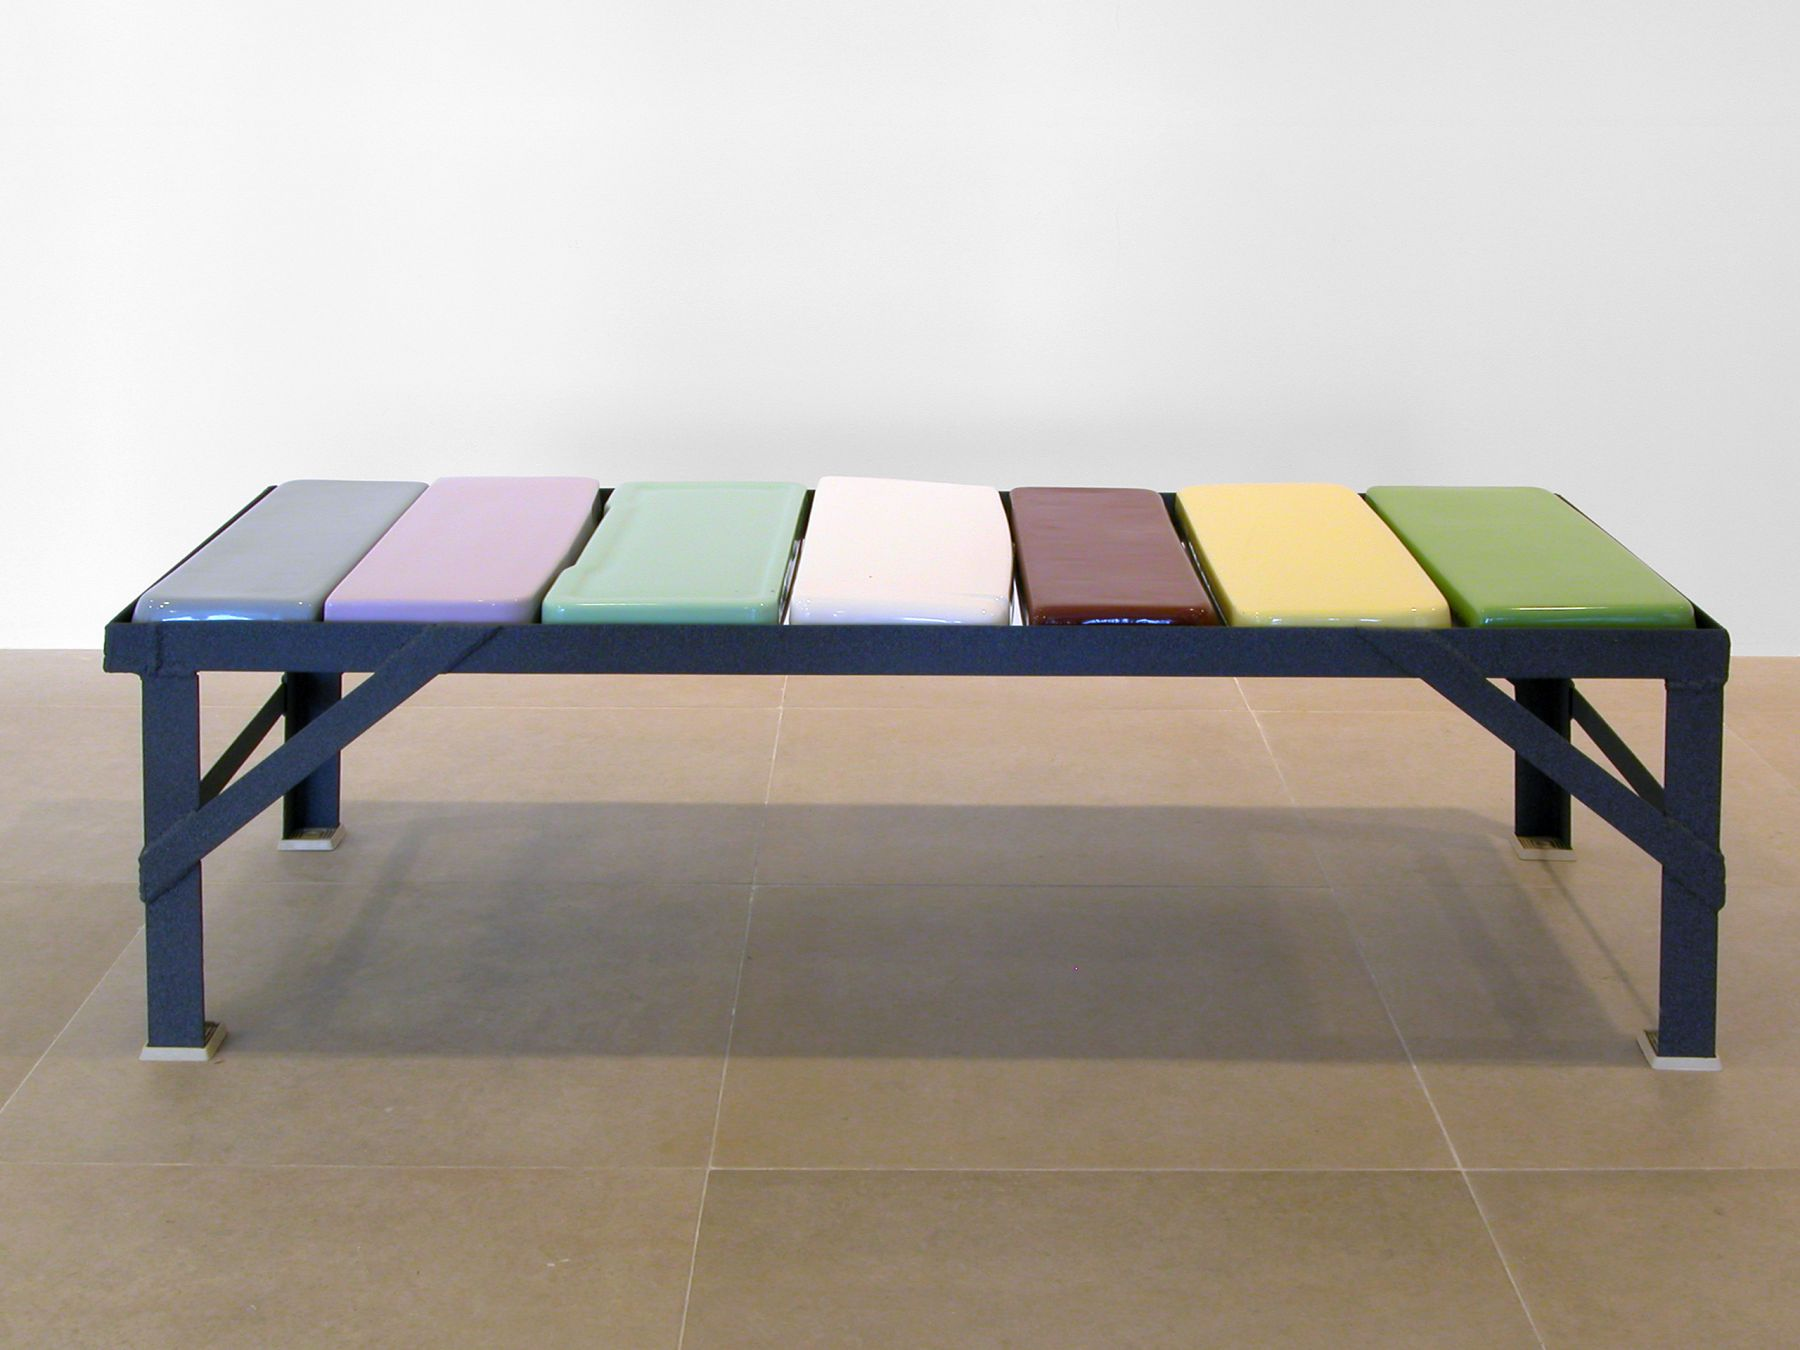 Jim Drain, Toilet Top Bench, 2007, Mixed media, 18 1/2 x 56 1/4 x 22 inches